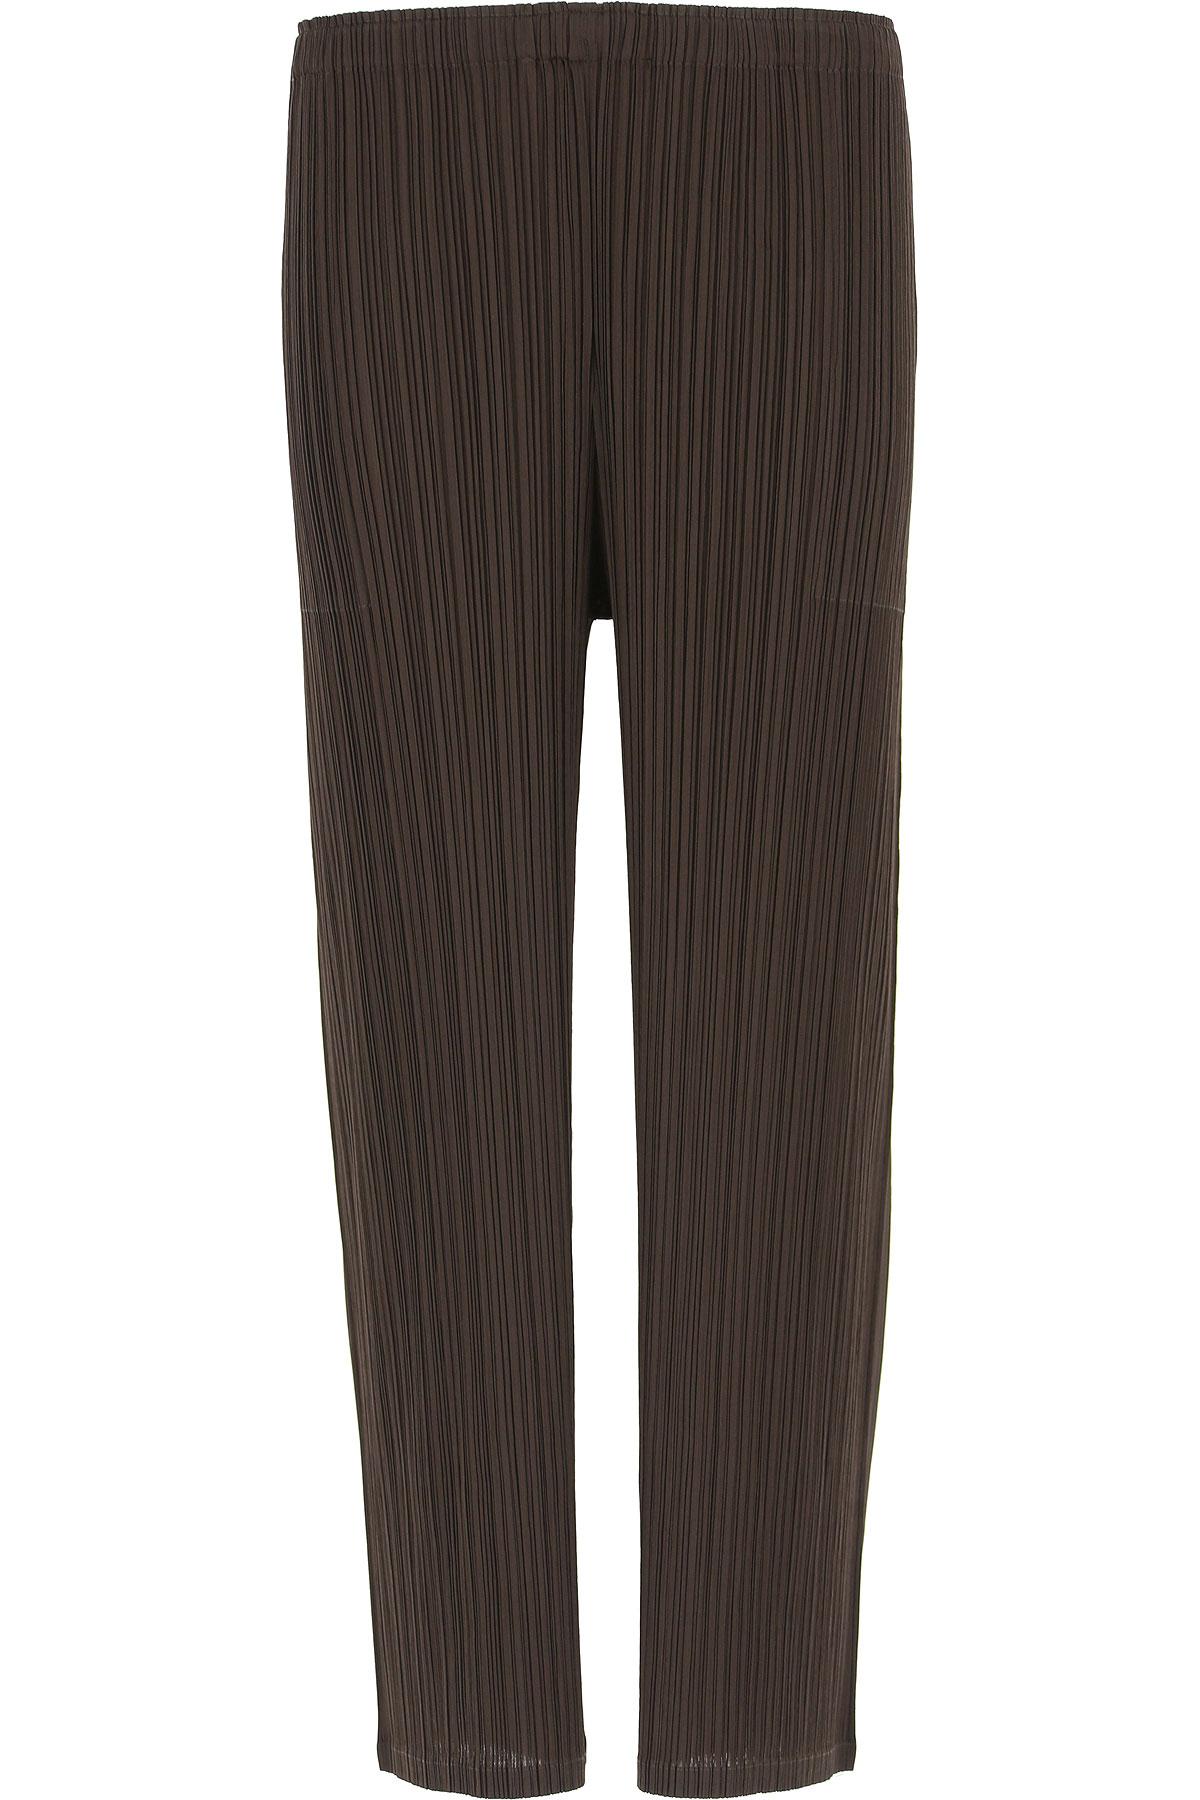 Image of Issey Miyake Pants for Women, Dark Brown, polyester, 2017